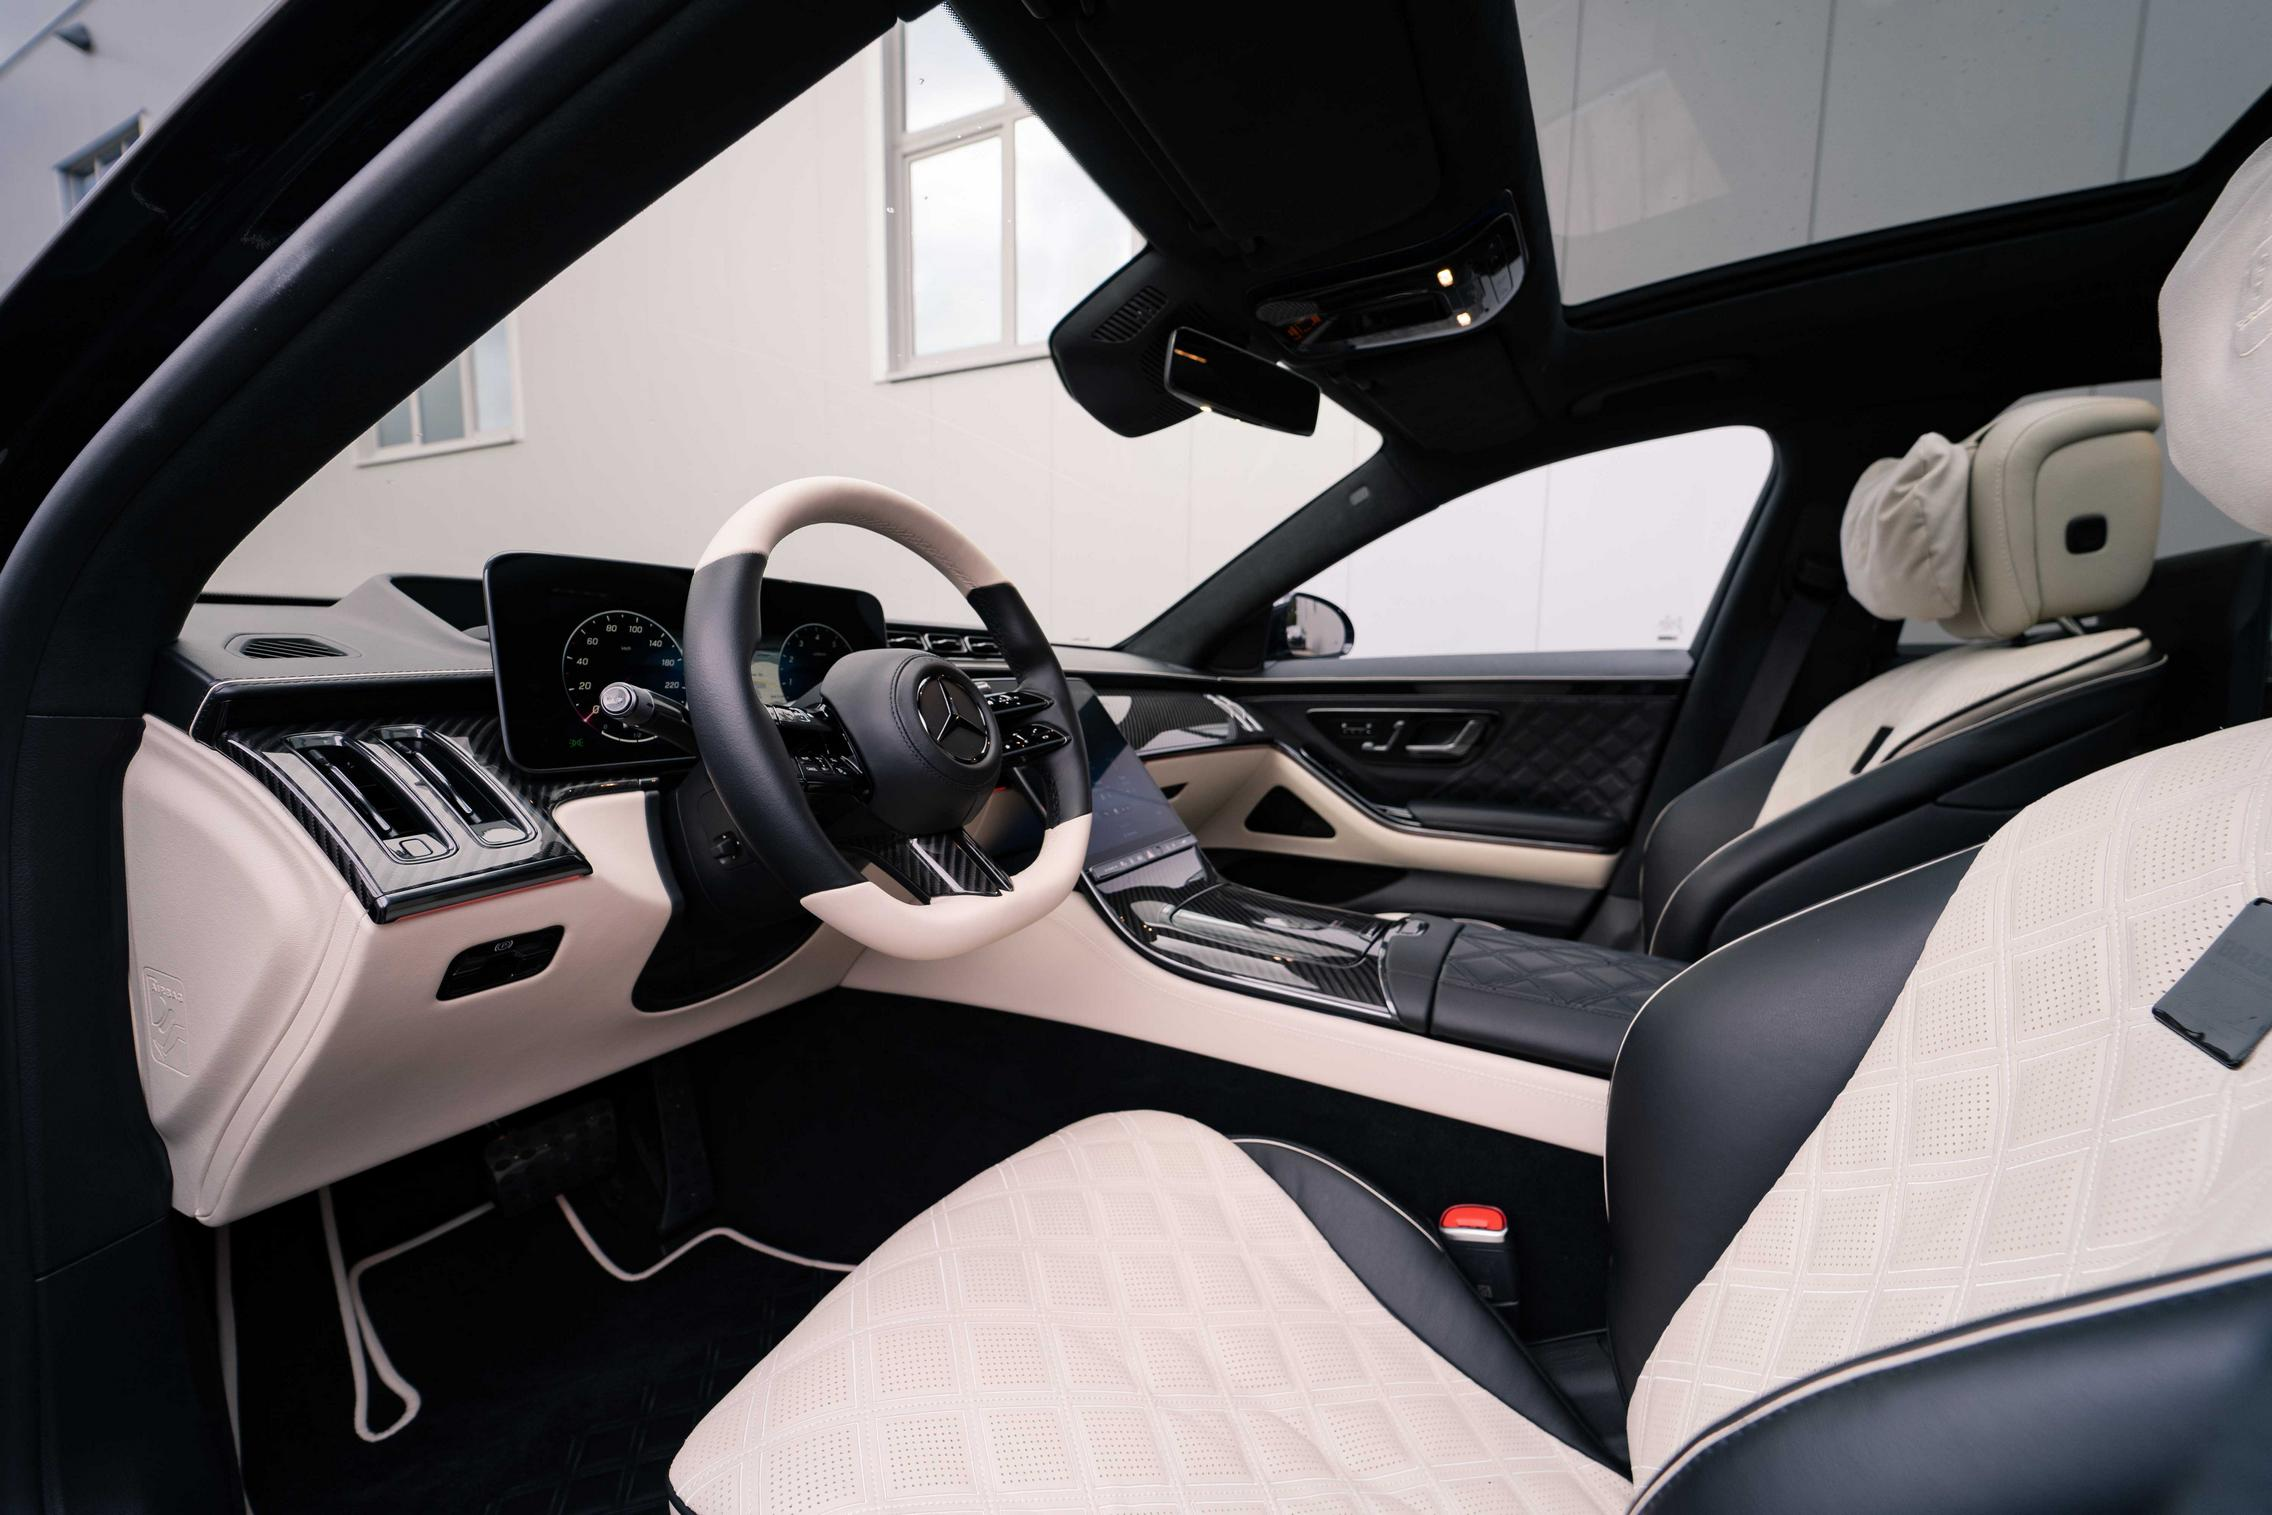 Brabus S-Class interior